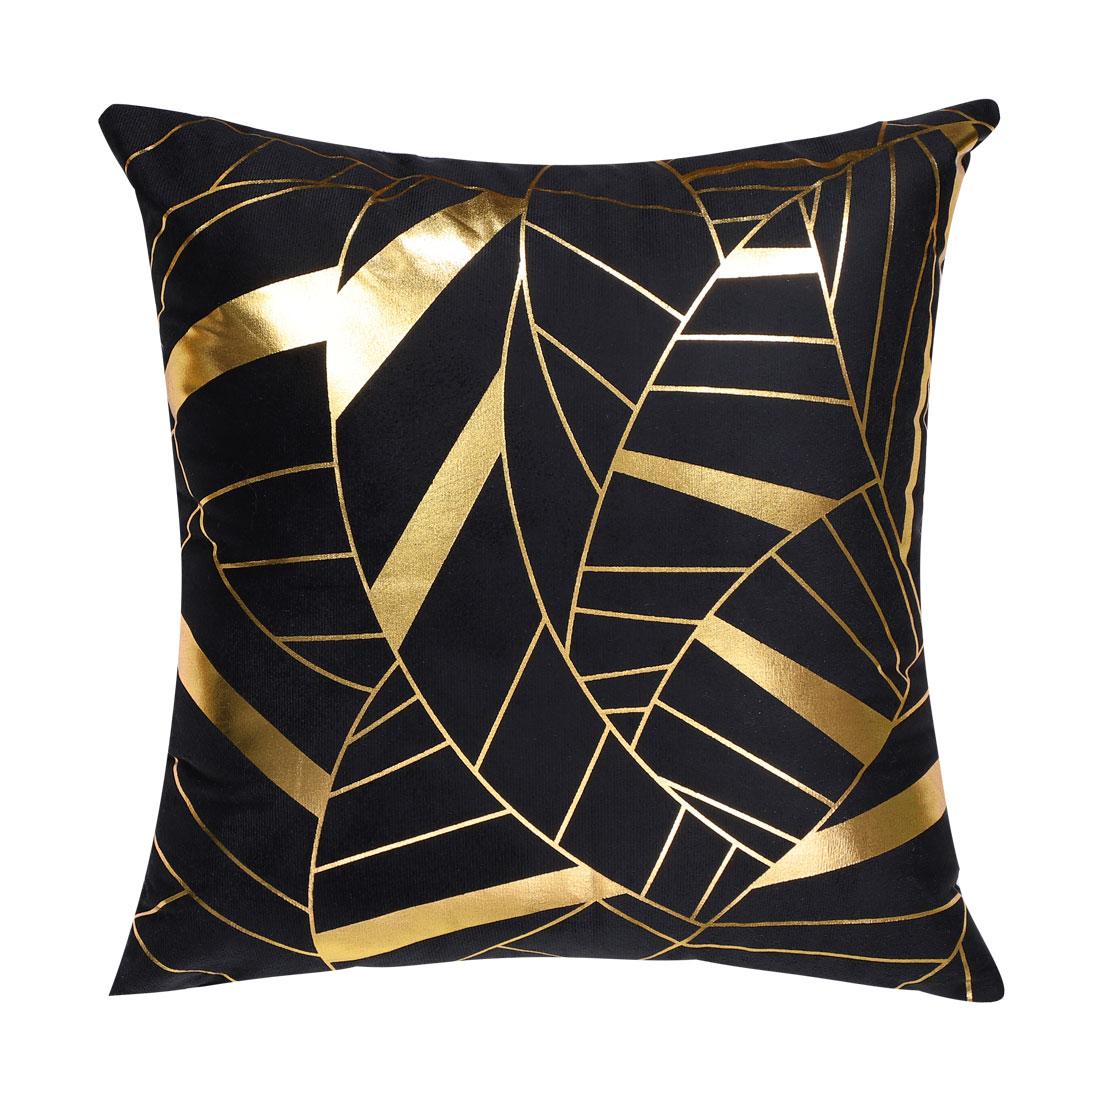 Decoration-Pillow-Covers-Cotton-Linen-Throw-Pillow-Case-Cushion-Cover thumbnail 28